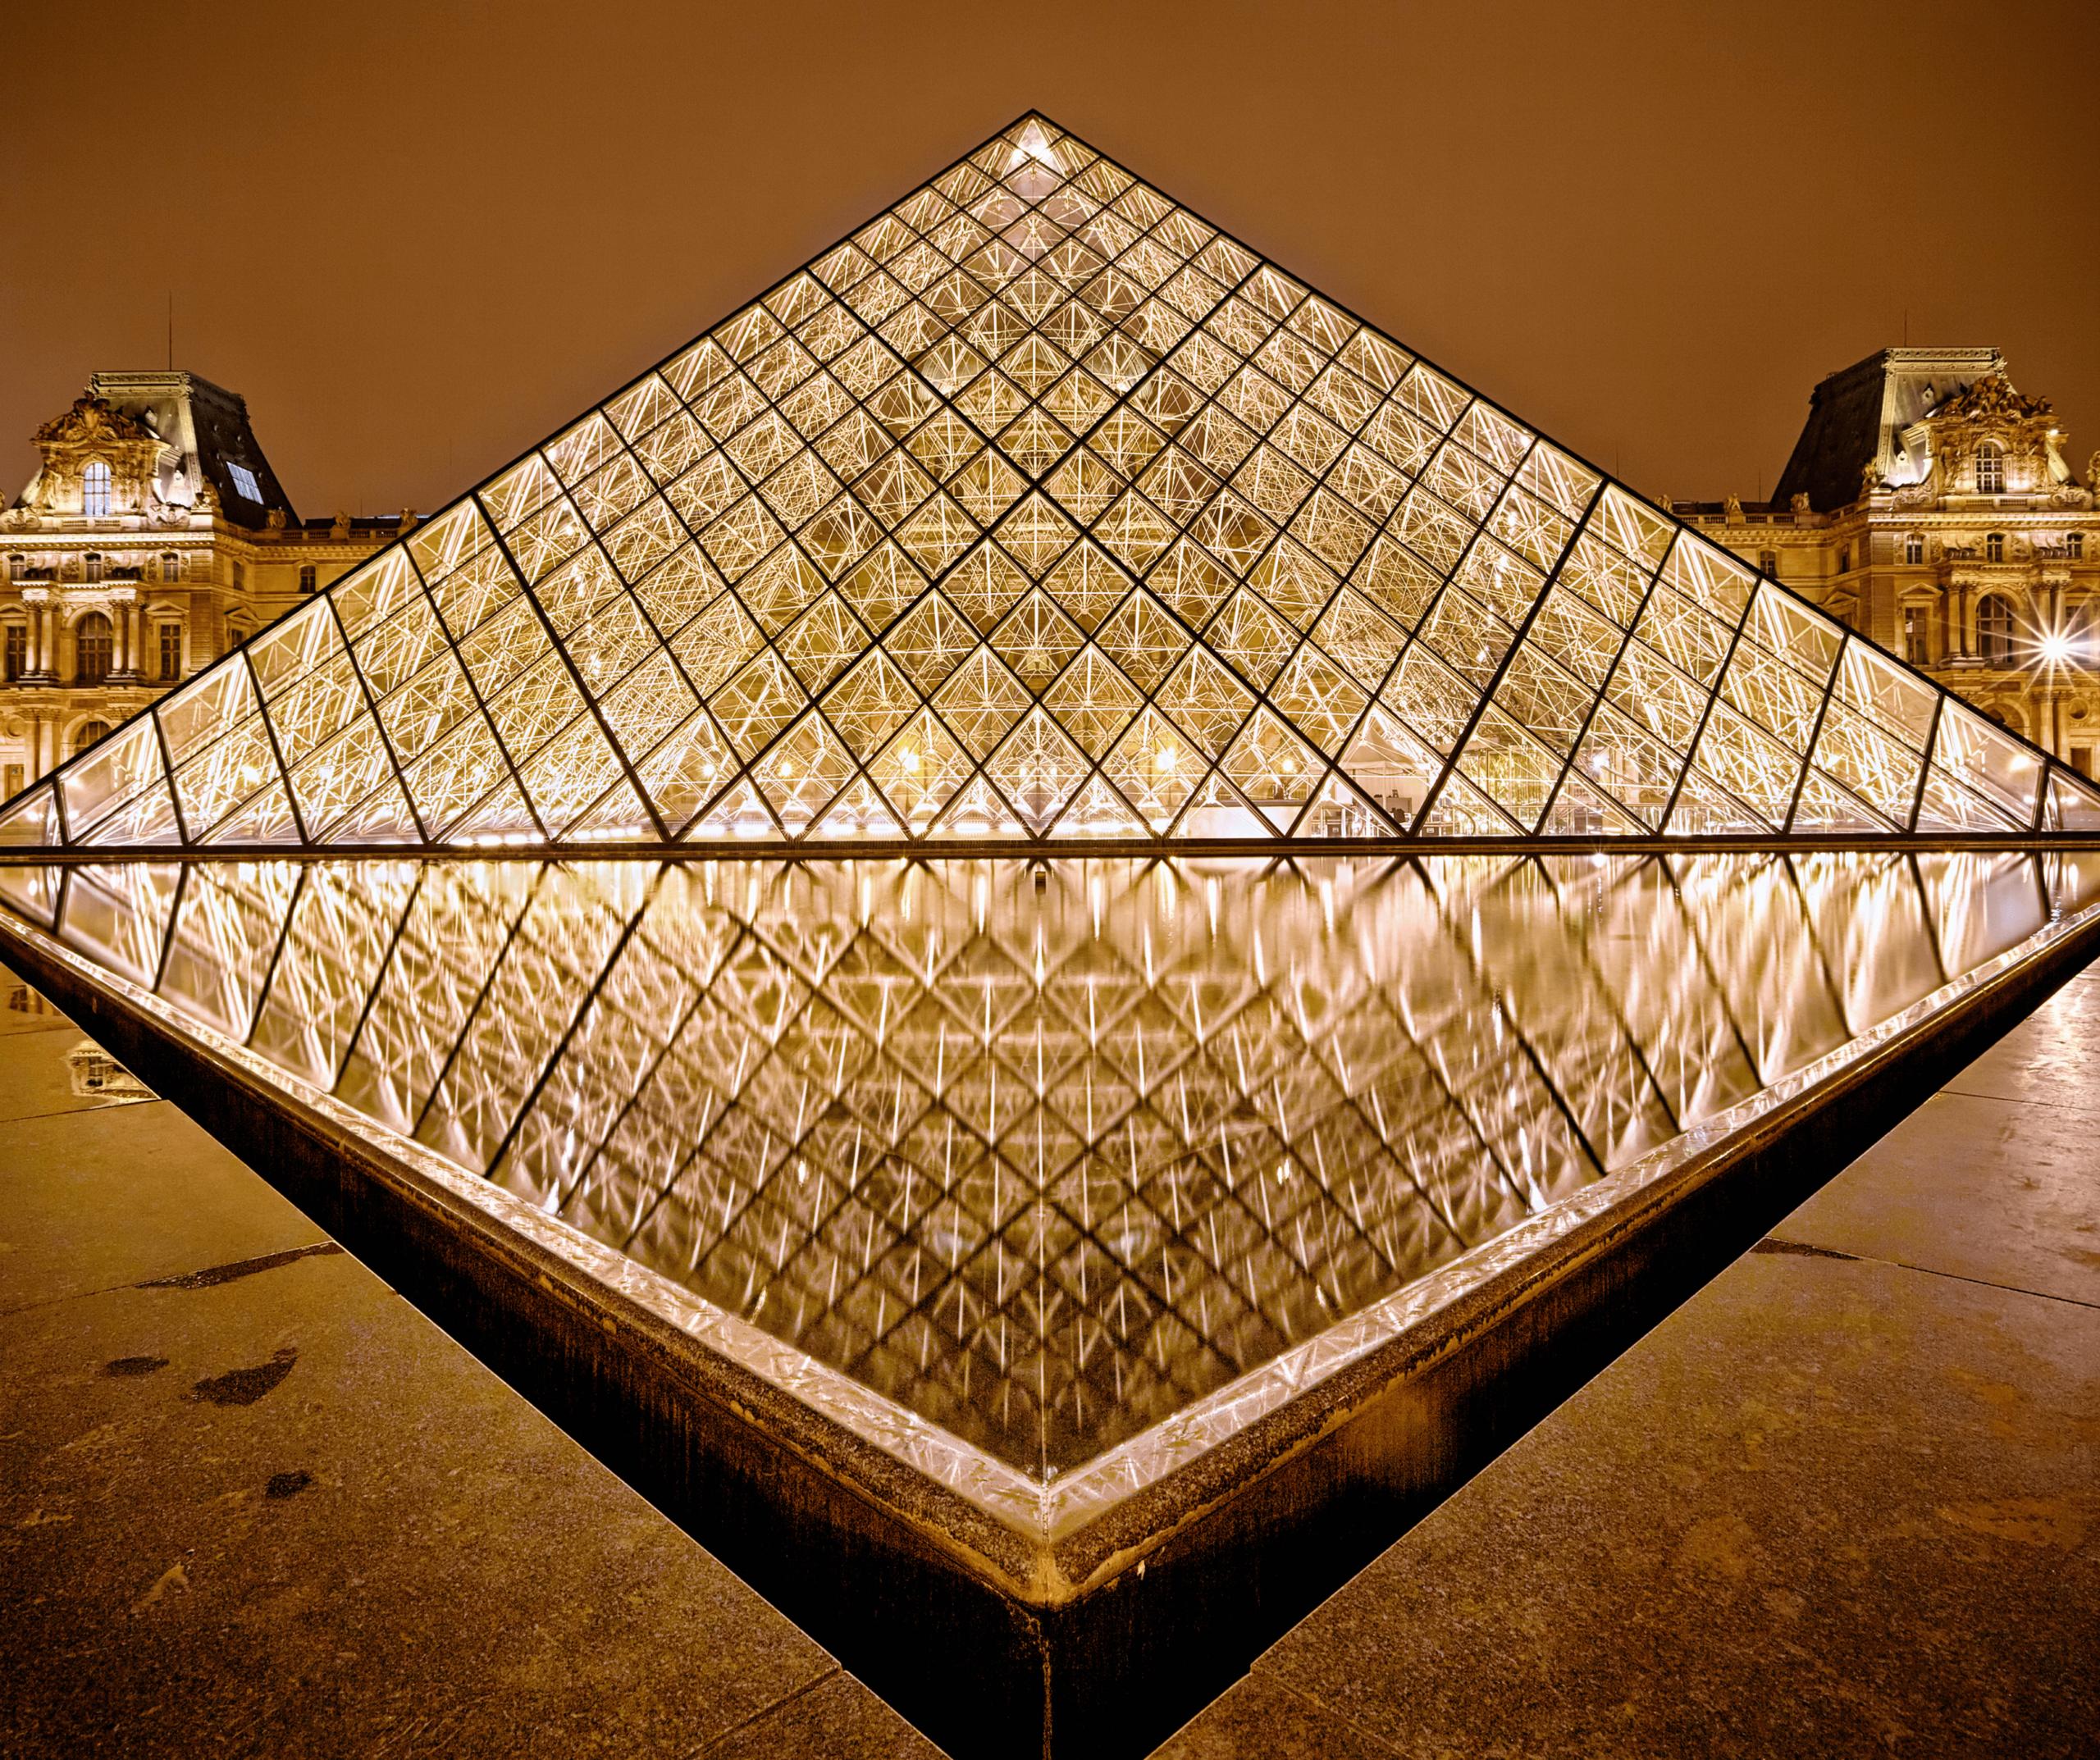 visit a museum virtually